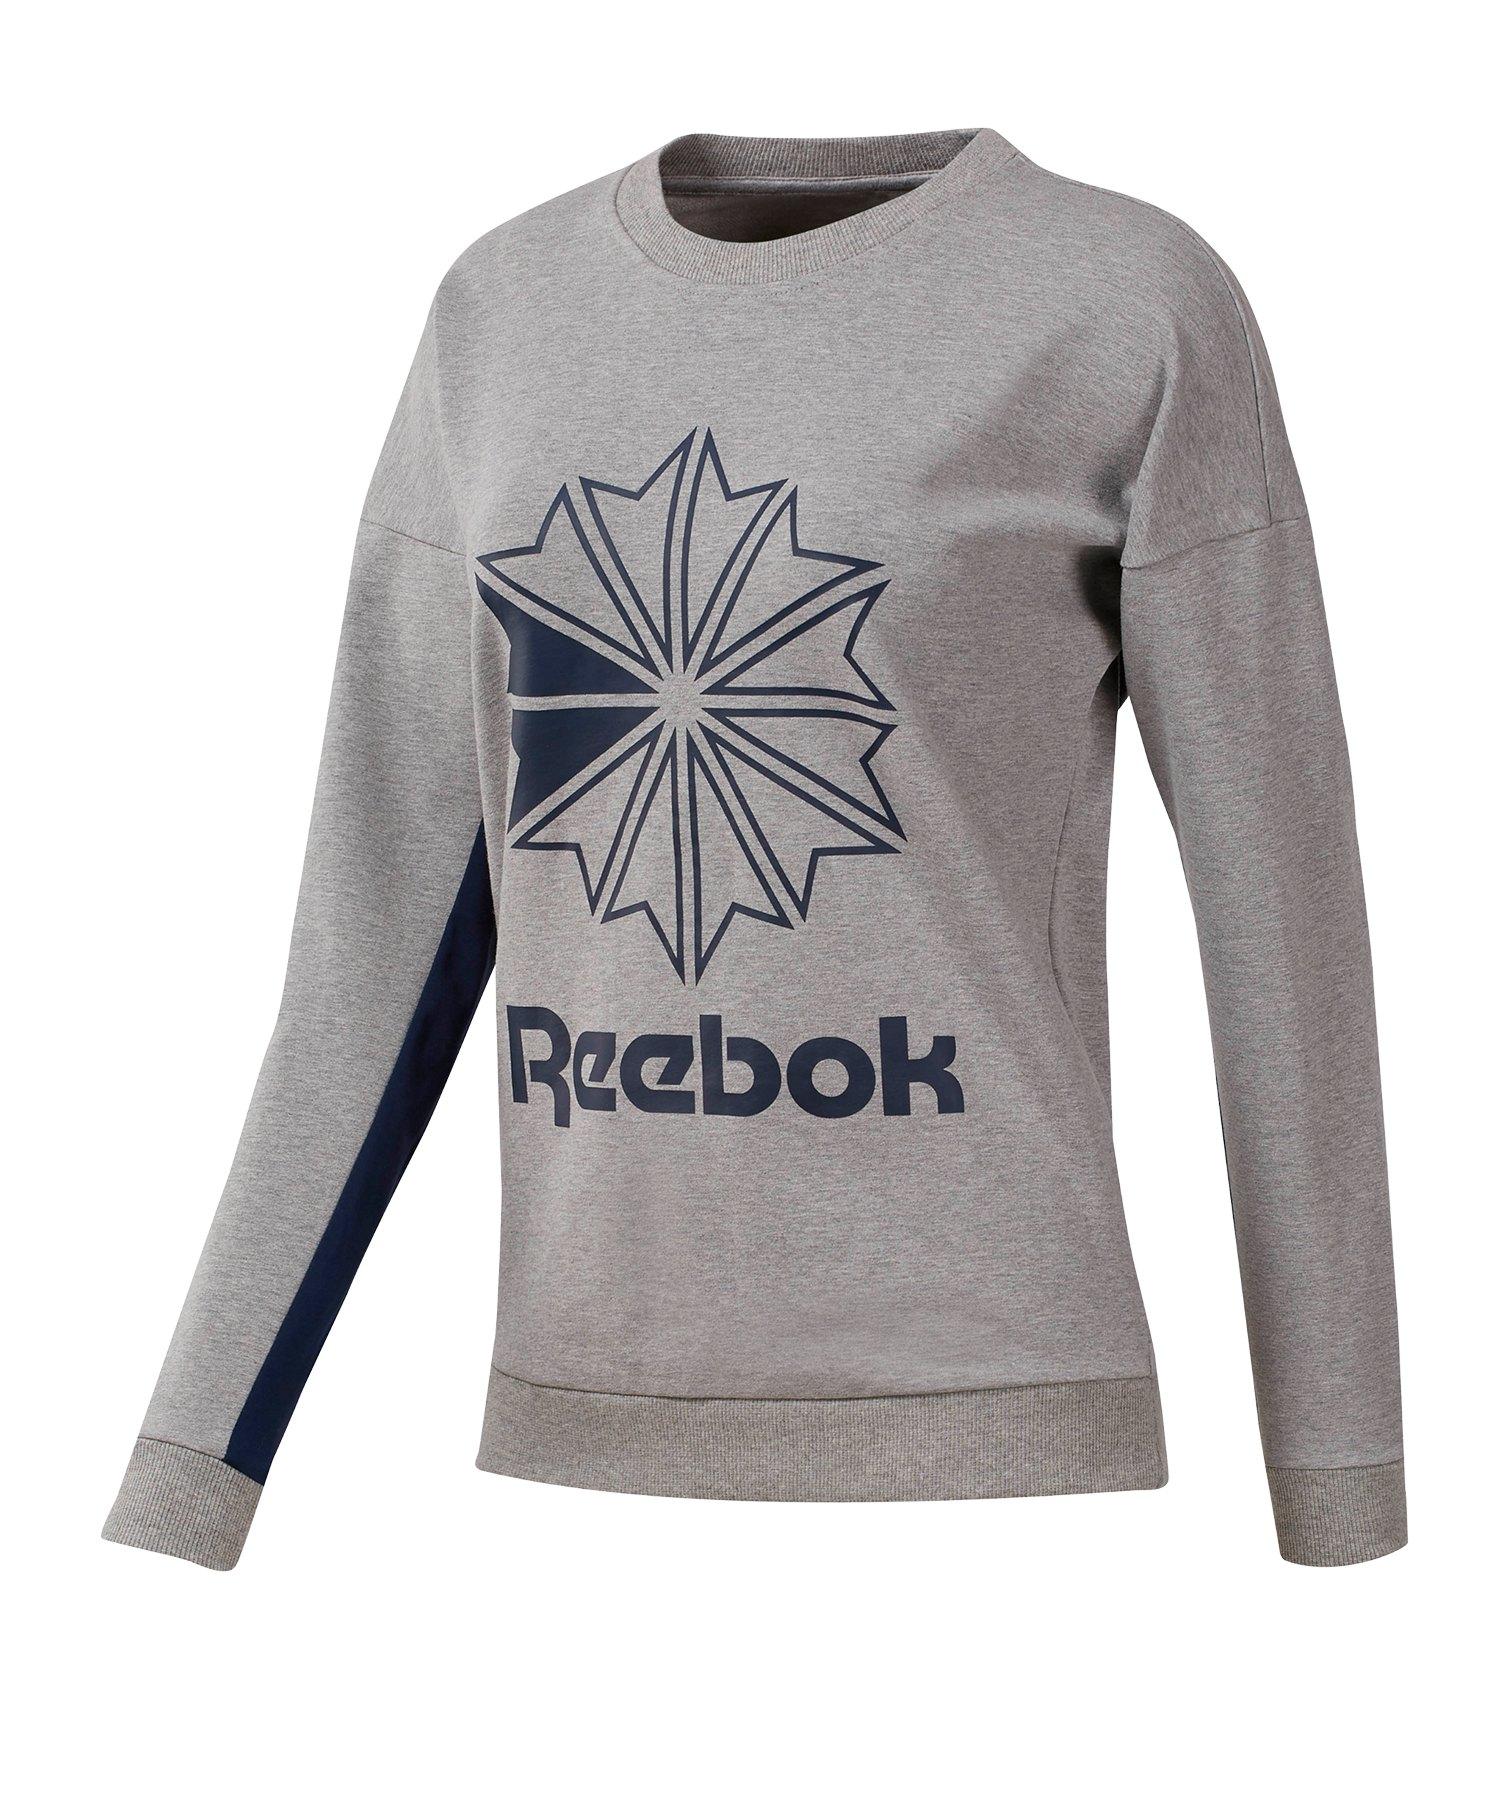 Reebok Classics FT Big Logo Sweatshirt Damen Grau - grau